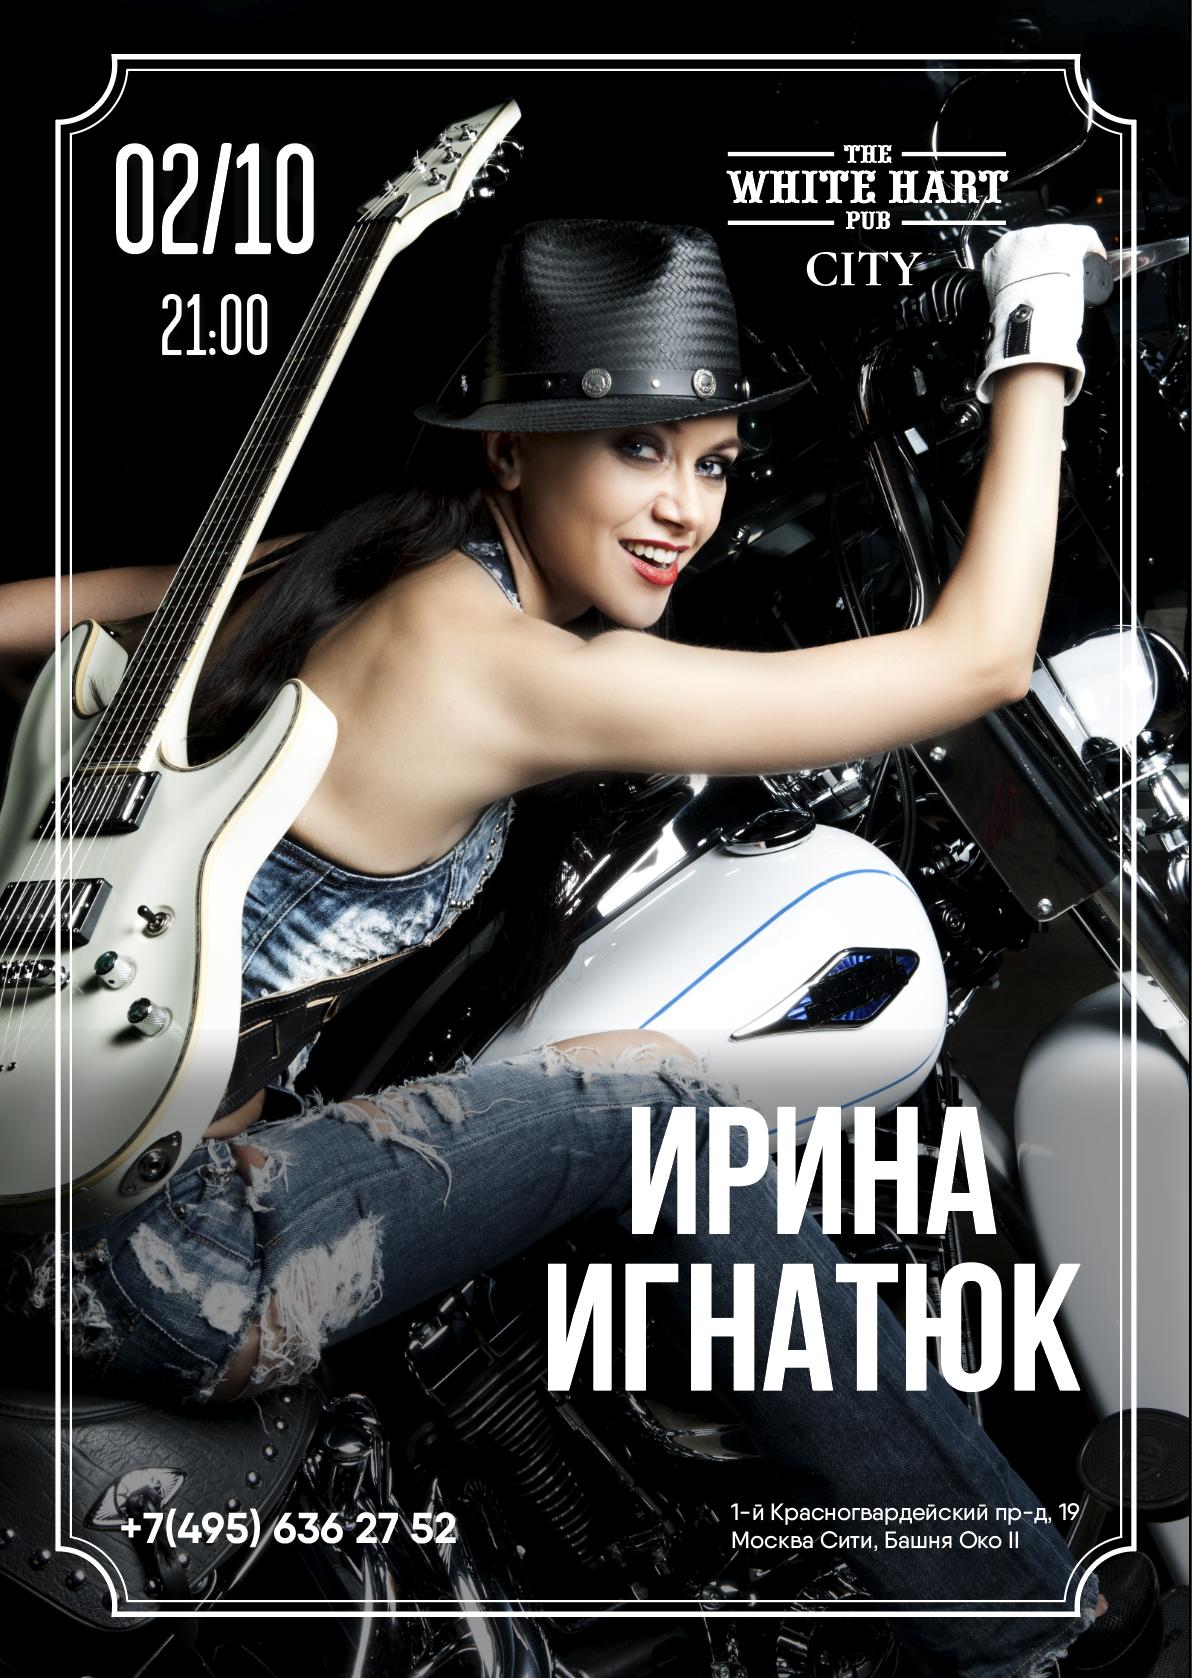 Афиша! 02 октября — Исполнительница Ирина Игнатюк в White Hart Pub Moscow City